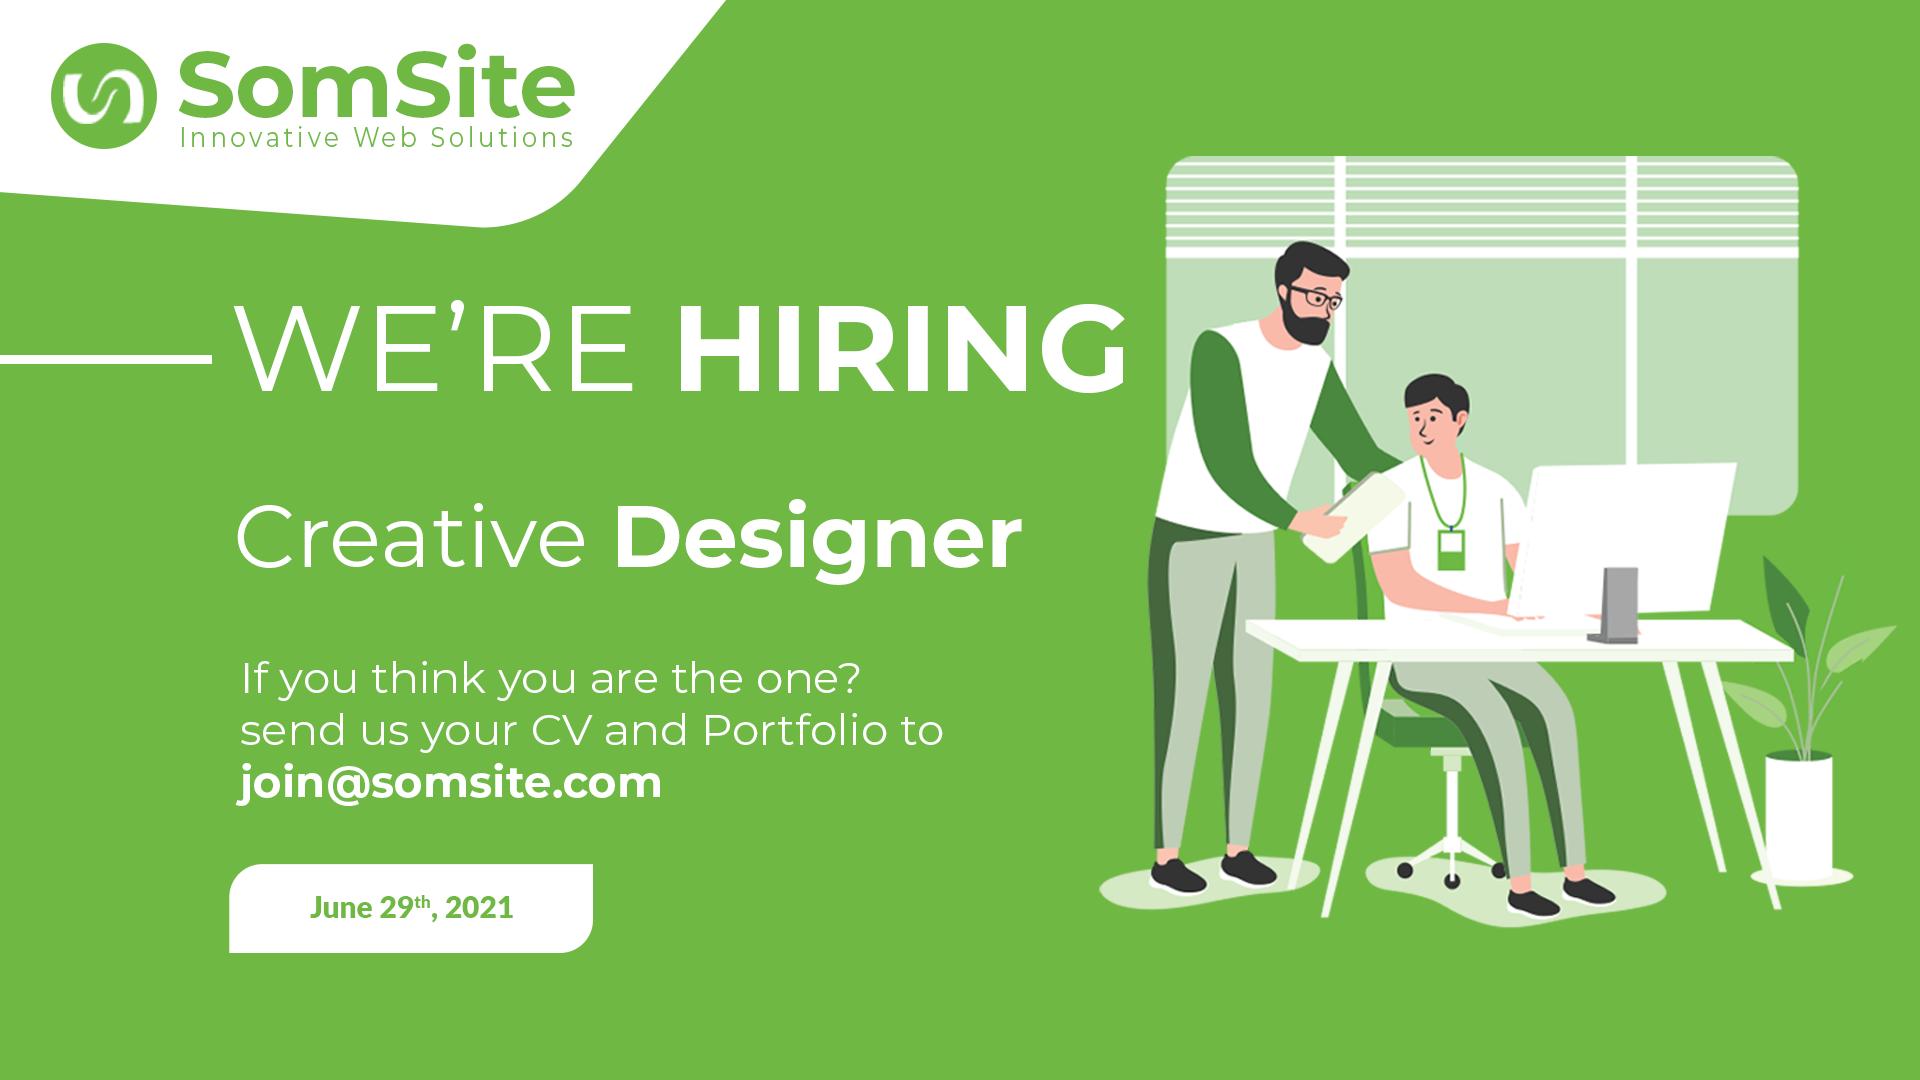 Job Opportunity: Creative Designer